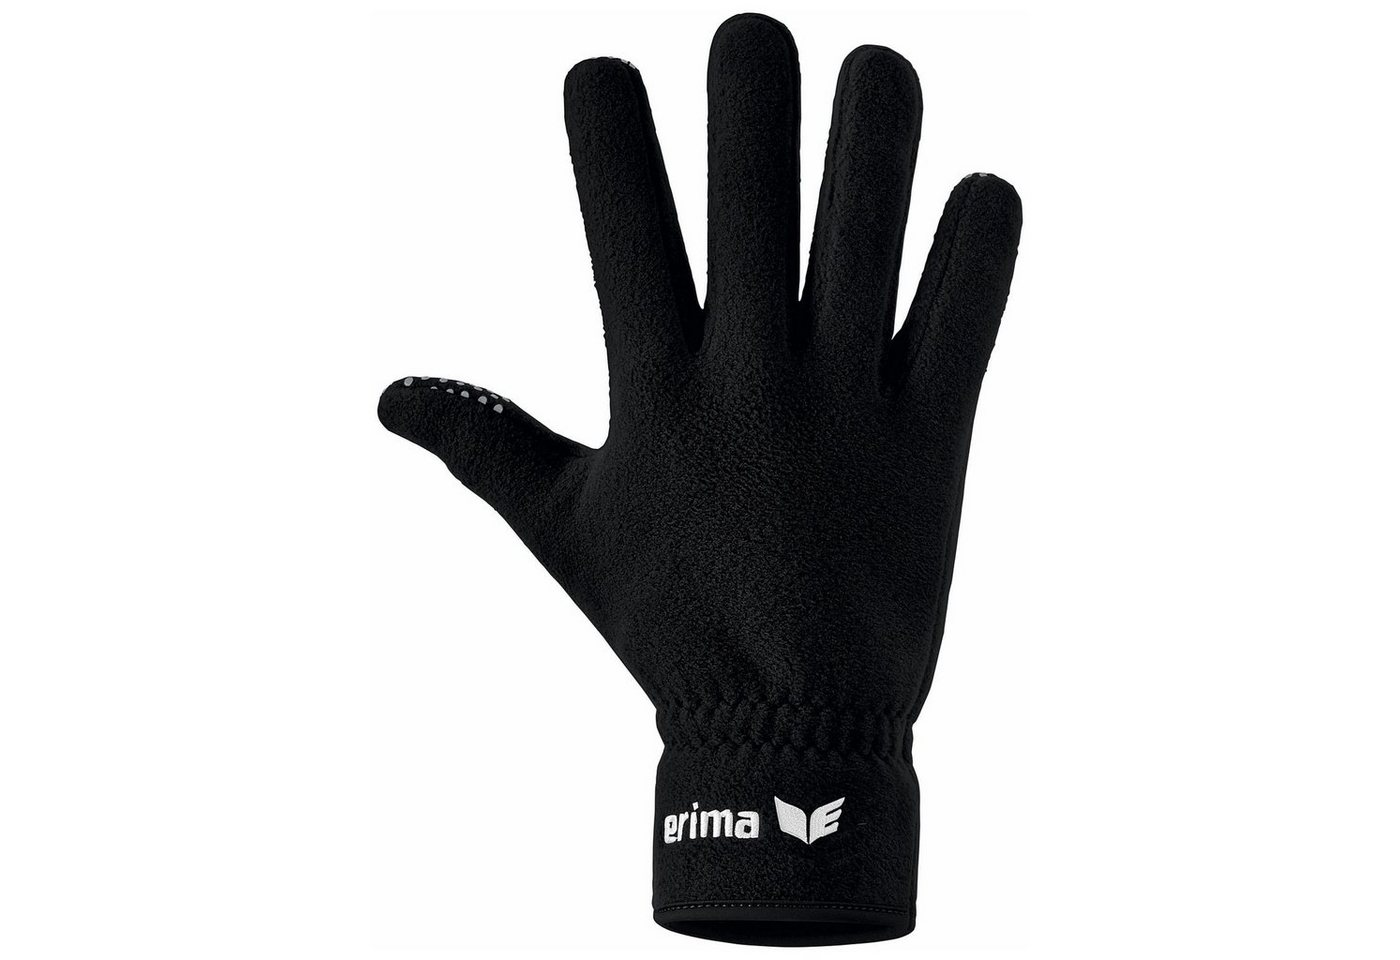 Erima Feldspielerhandschuh | Accessoires > Handschuhe > Sonstige Handschuhe | Schwarz | Polyvinylchlorid | Erima